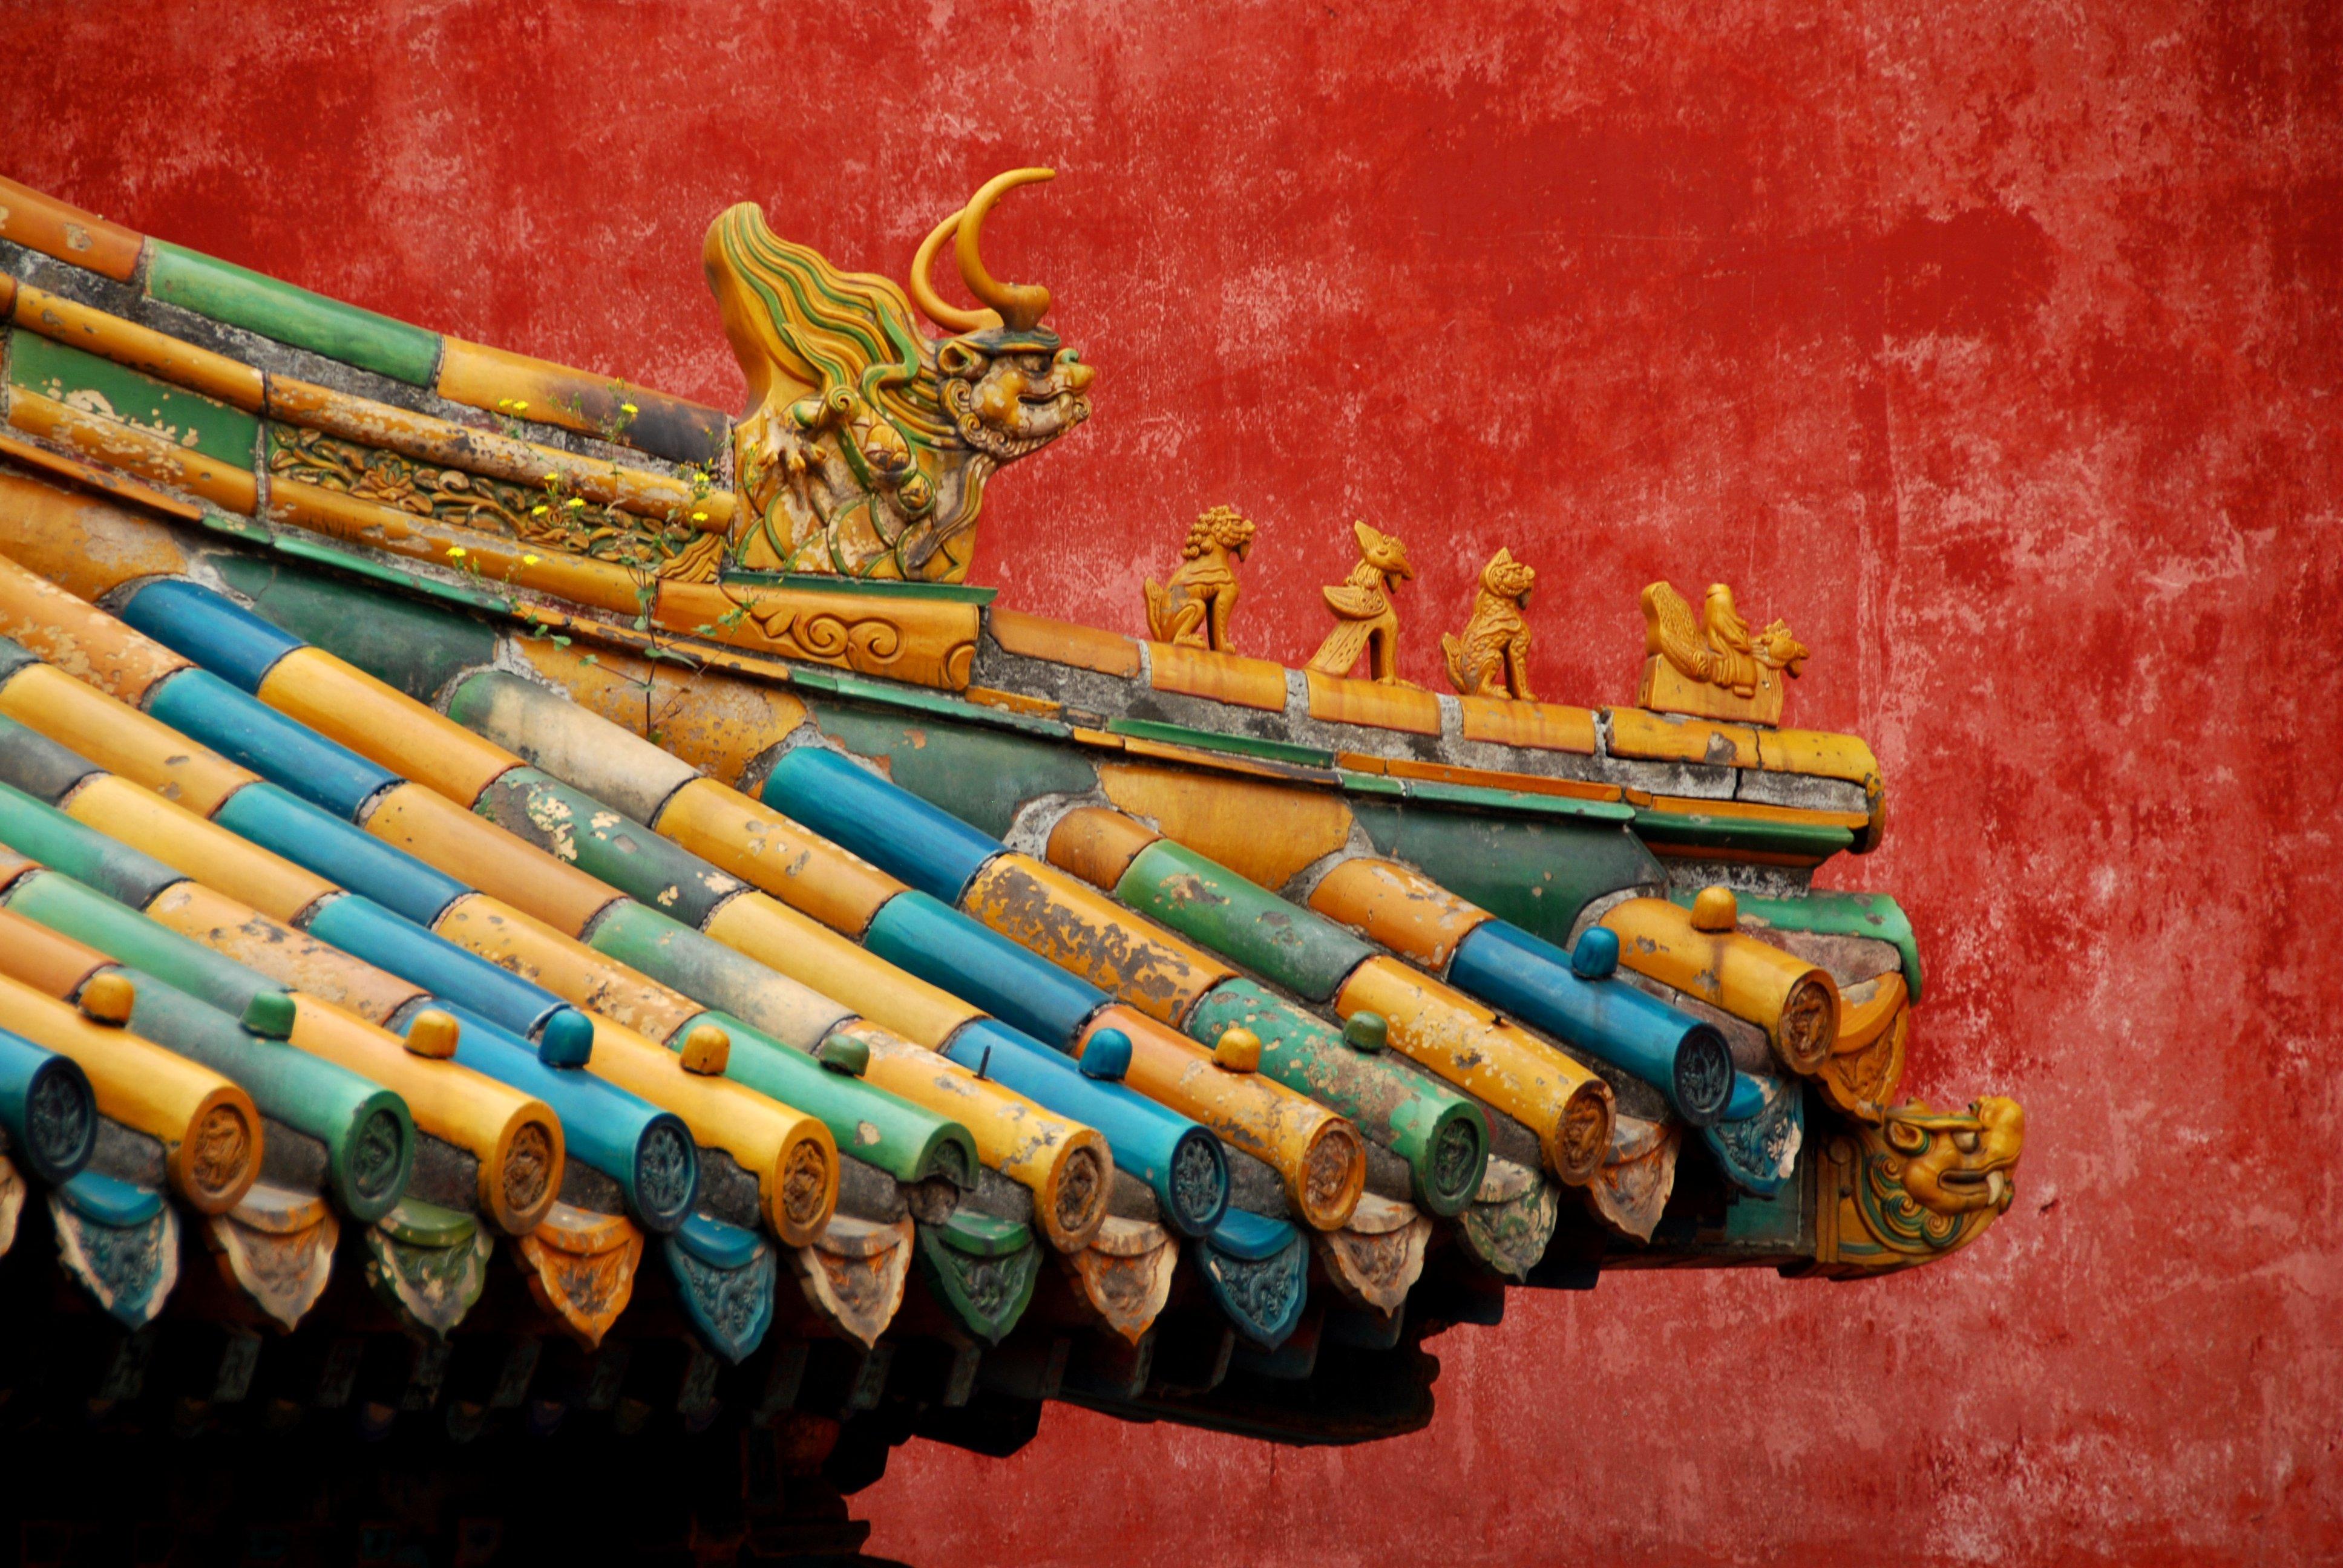 FileForbidden City ColorsJPG